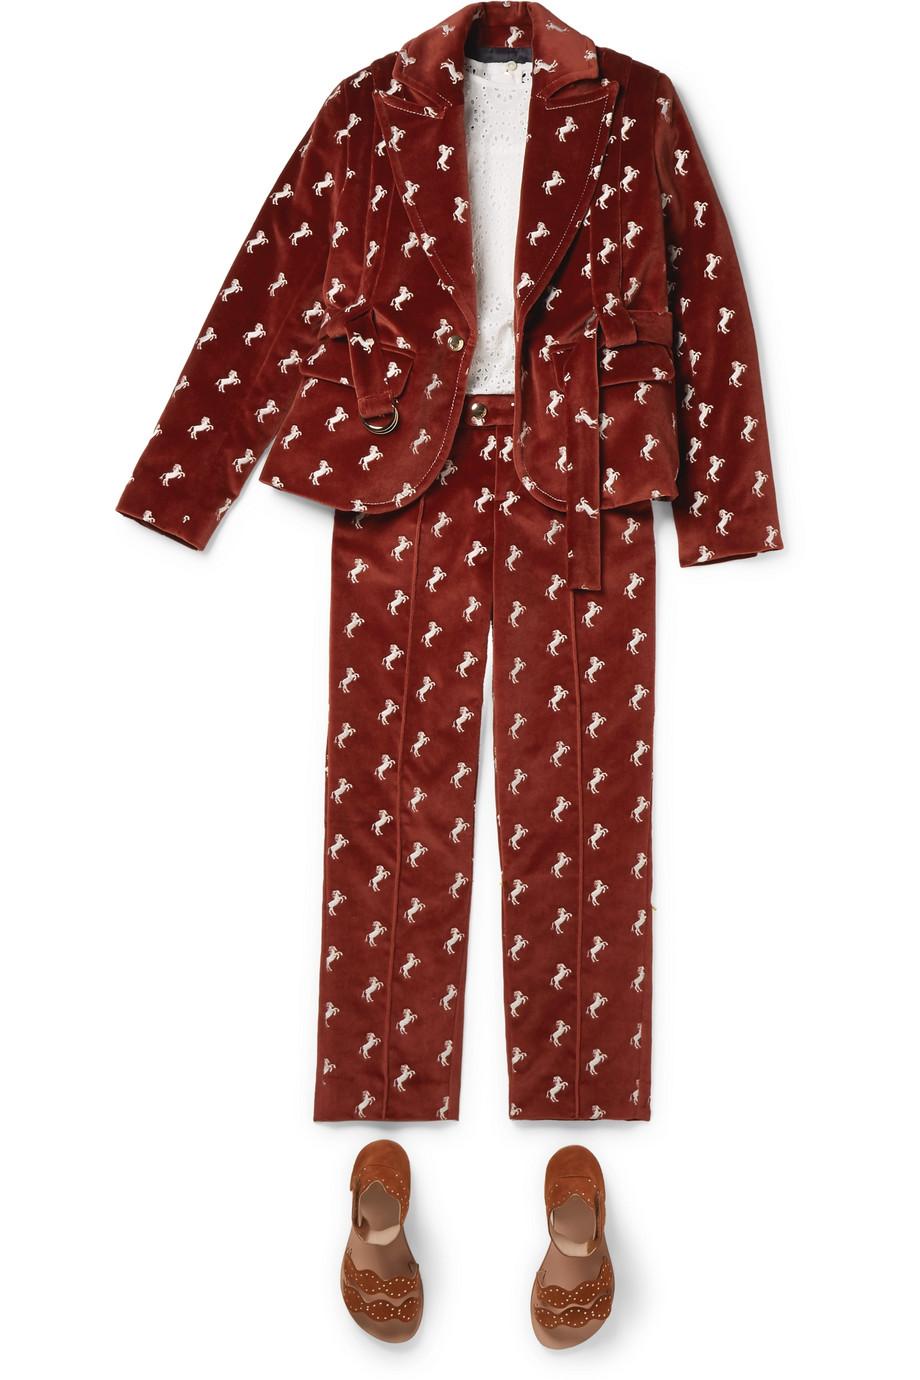 Chloé Kids Ages 6 - 12 embroidered cotton-velvet pants